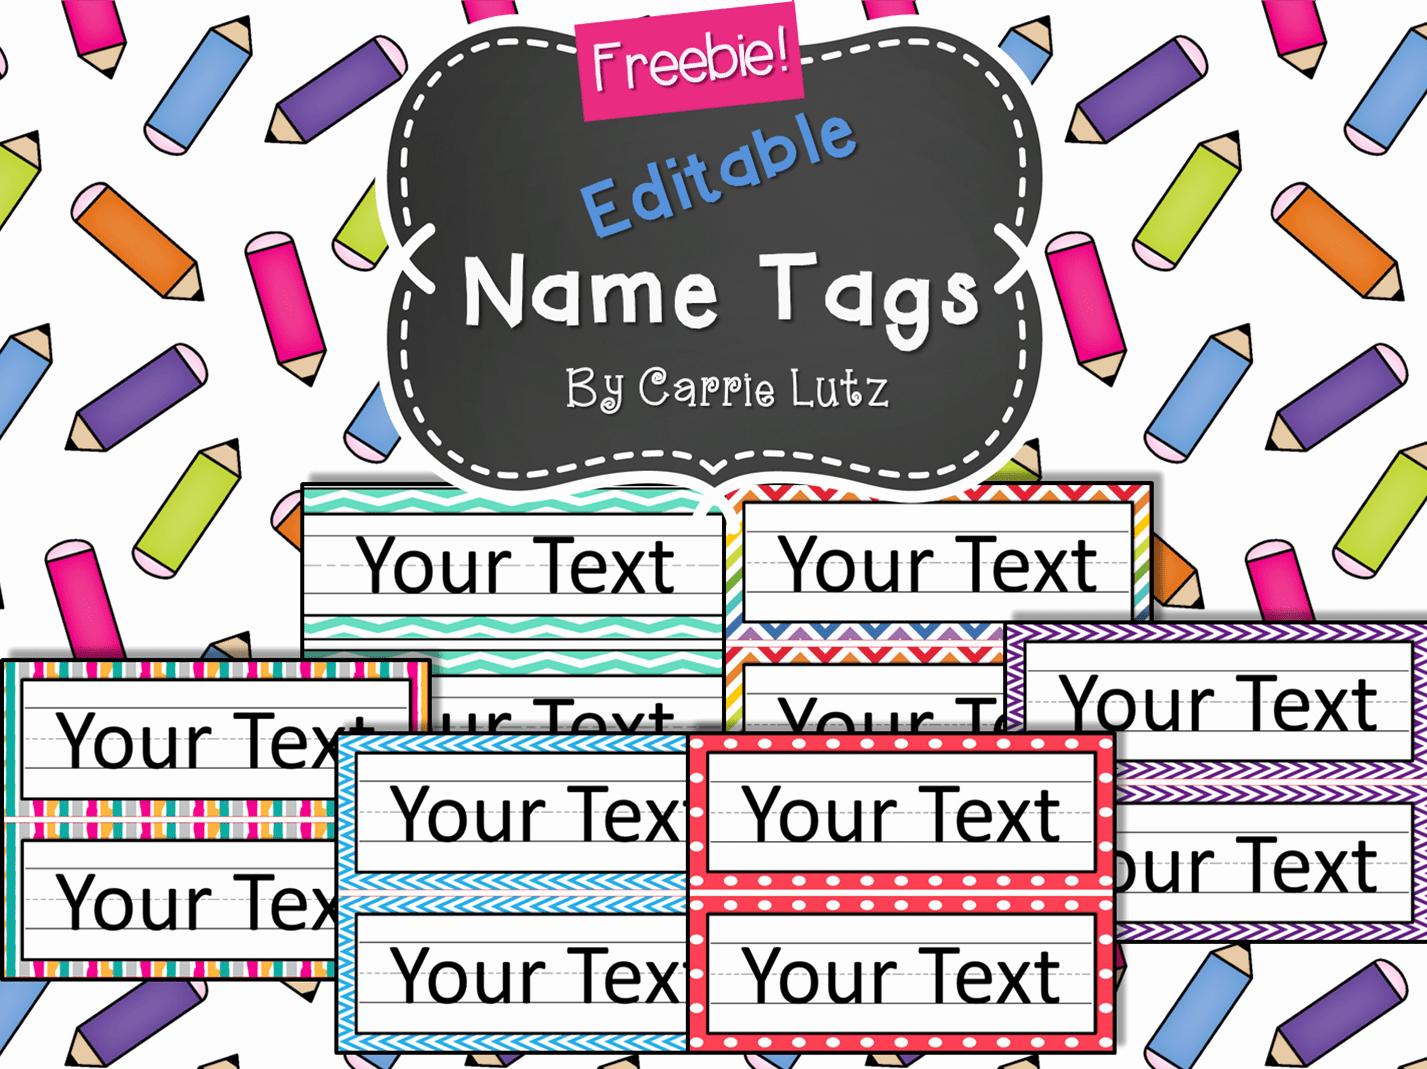 Free Printable Desk Name Plates for Students Inspirational Free Printable Desk Name Plates for Students – forprint